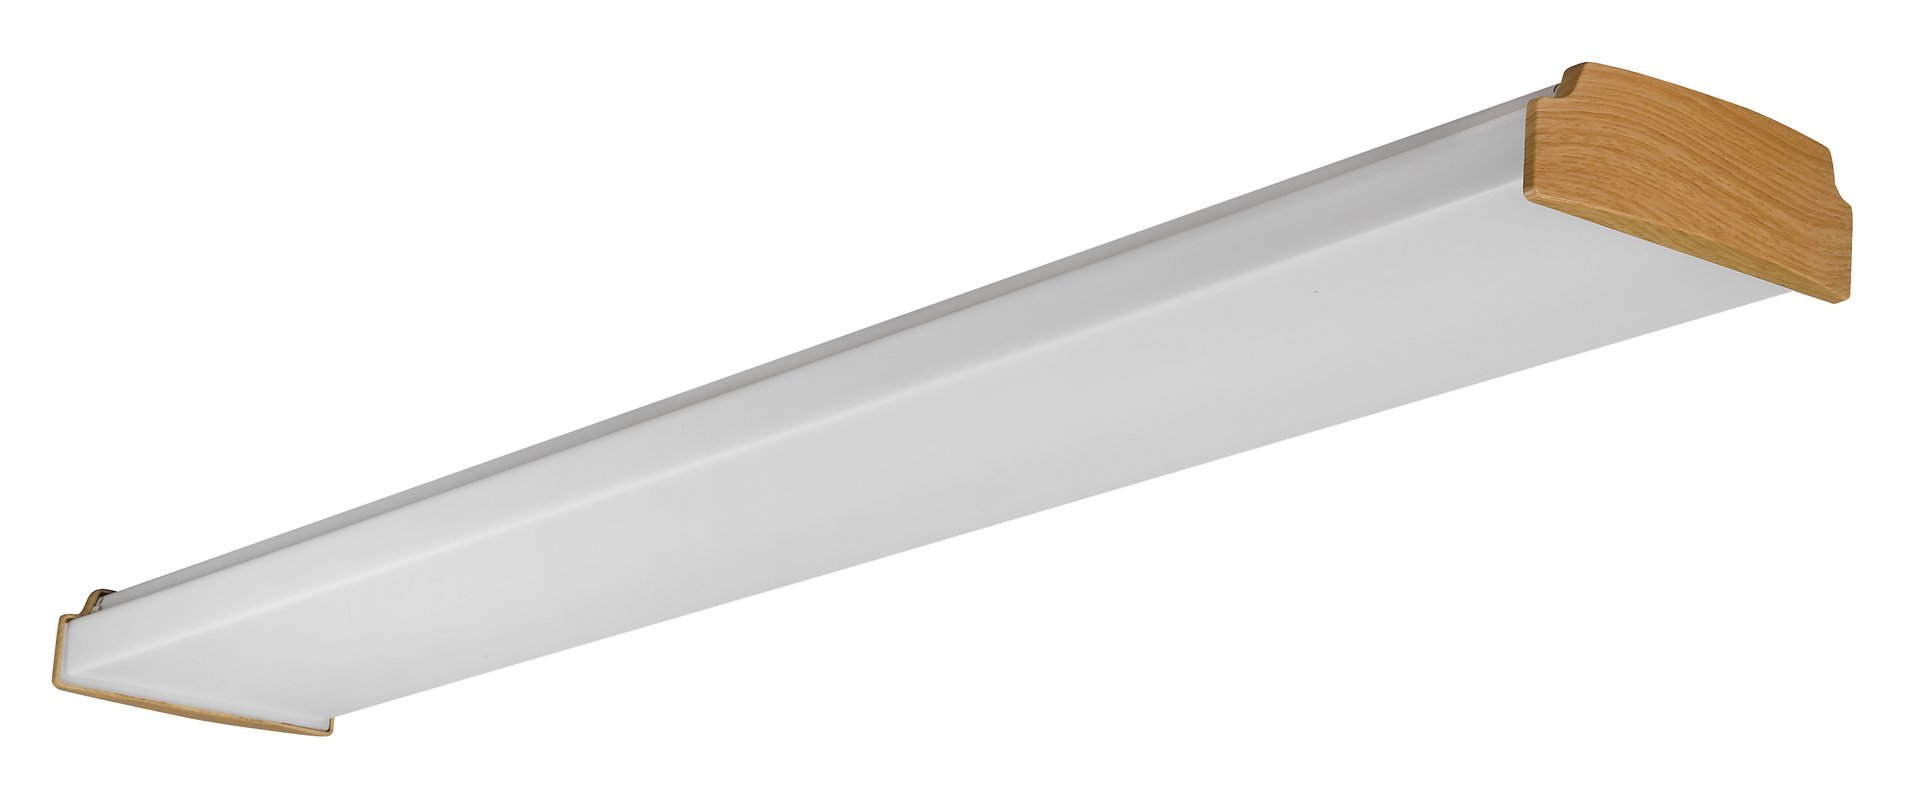 Lighting by AFX LW232LKR8 Low Profile 2-32 Watt T8 Wrap Light Fixture, Lancaster Oak with White Acrylic Diffuser